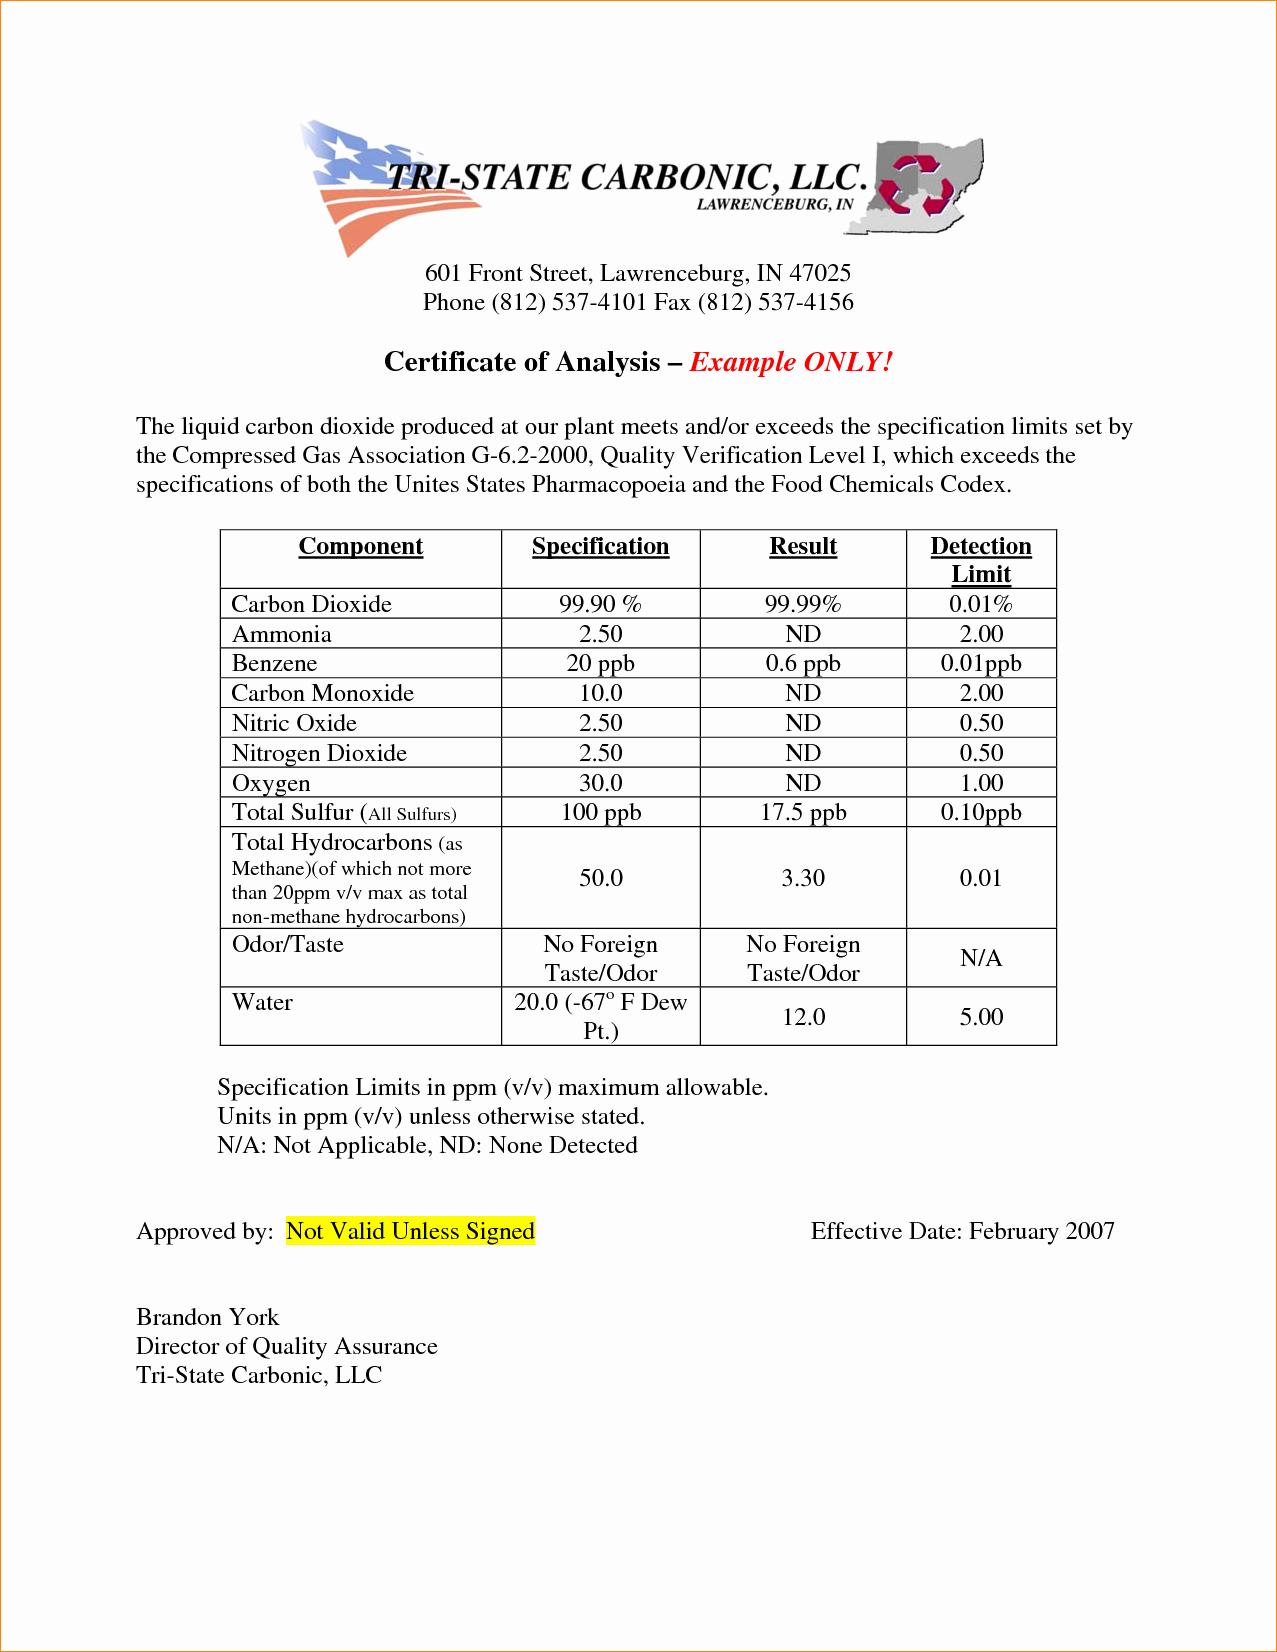 Certificate Of Analysis Template Elegant 5 Certificate Of Analysis Template